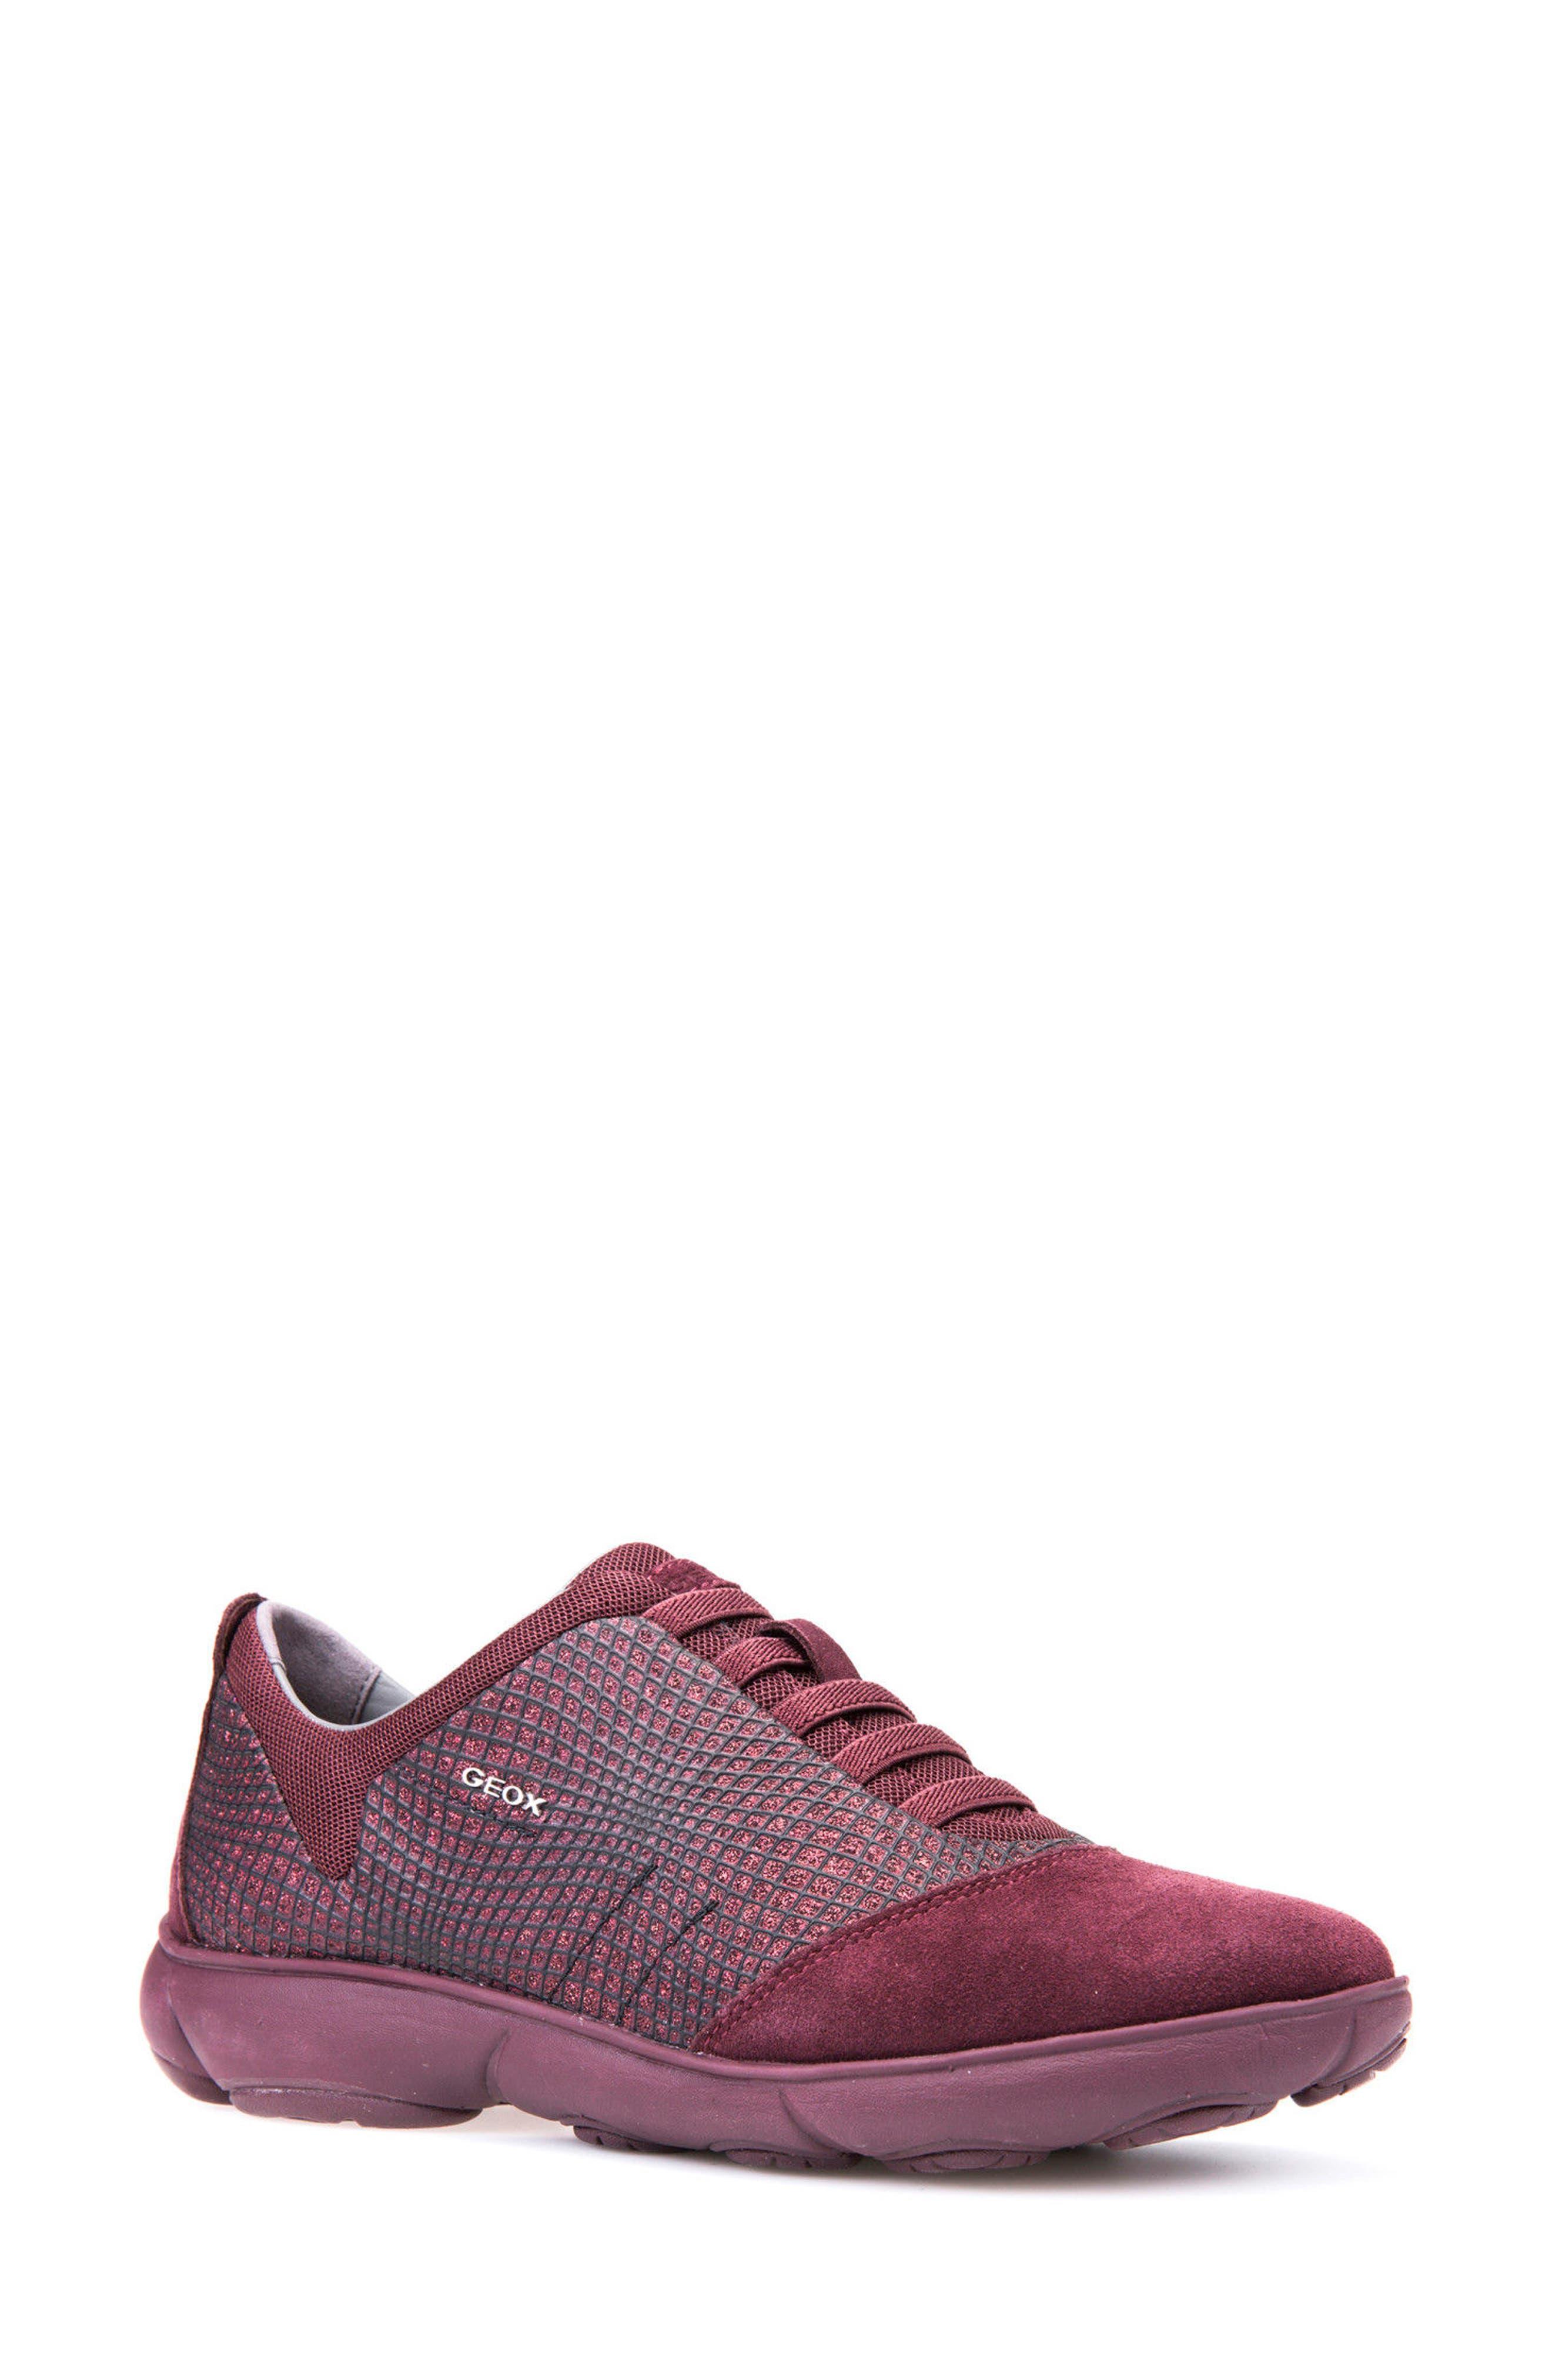 Main Image - Geox Nebula Slip-On Sneaker (Women)